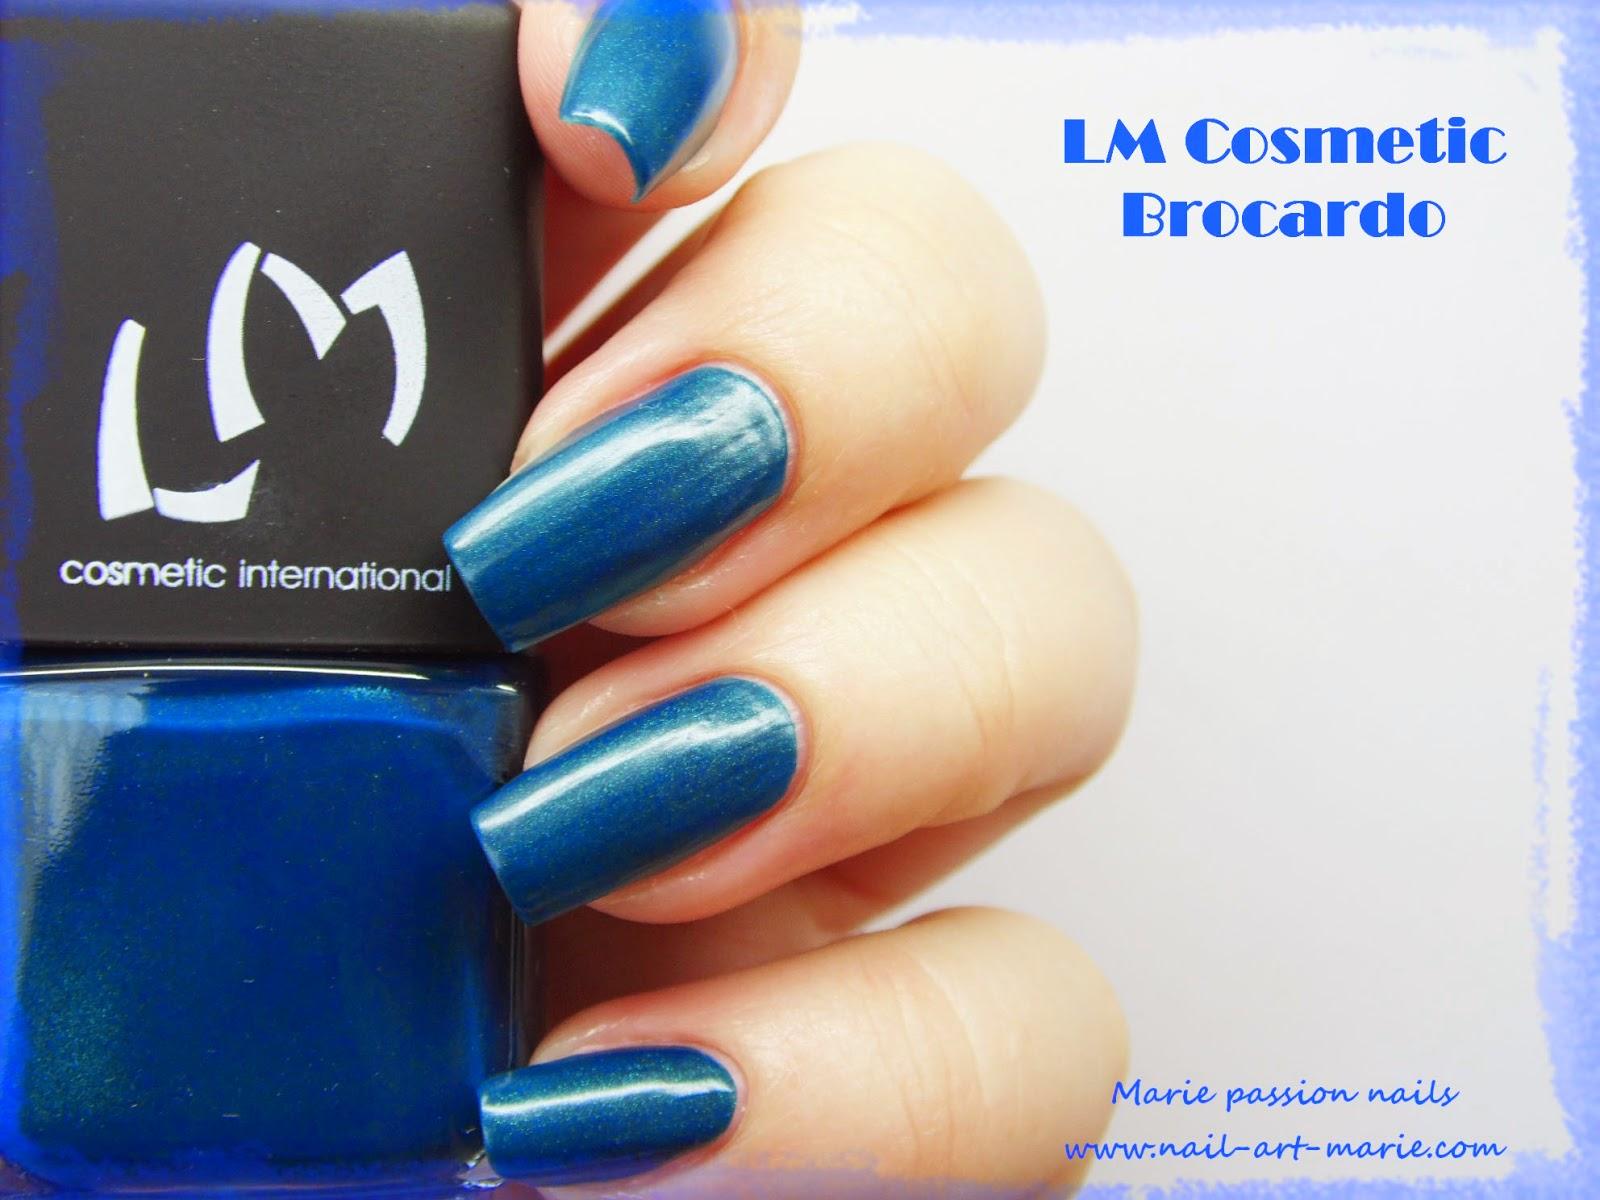 LM Cosmetic Brocardo1